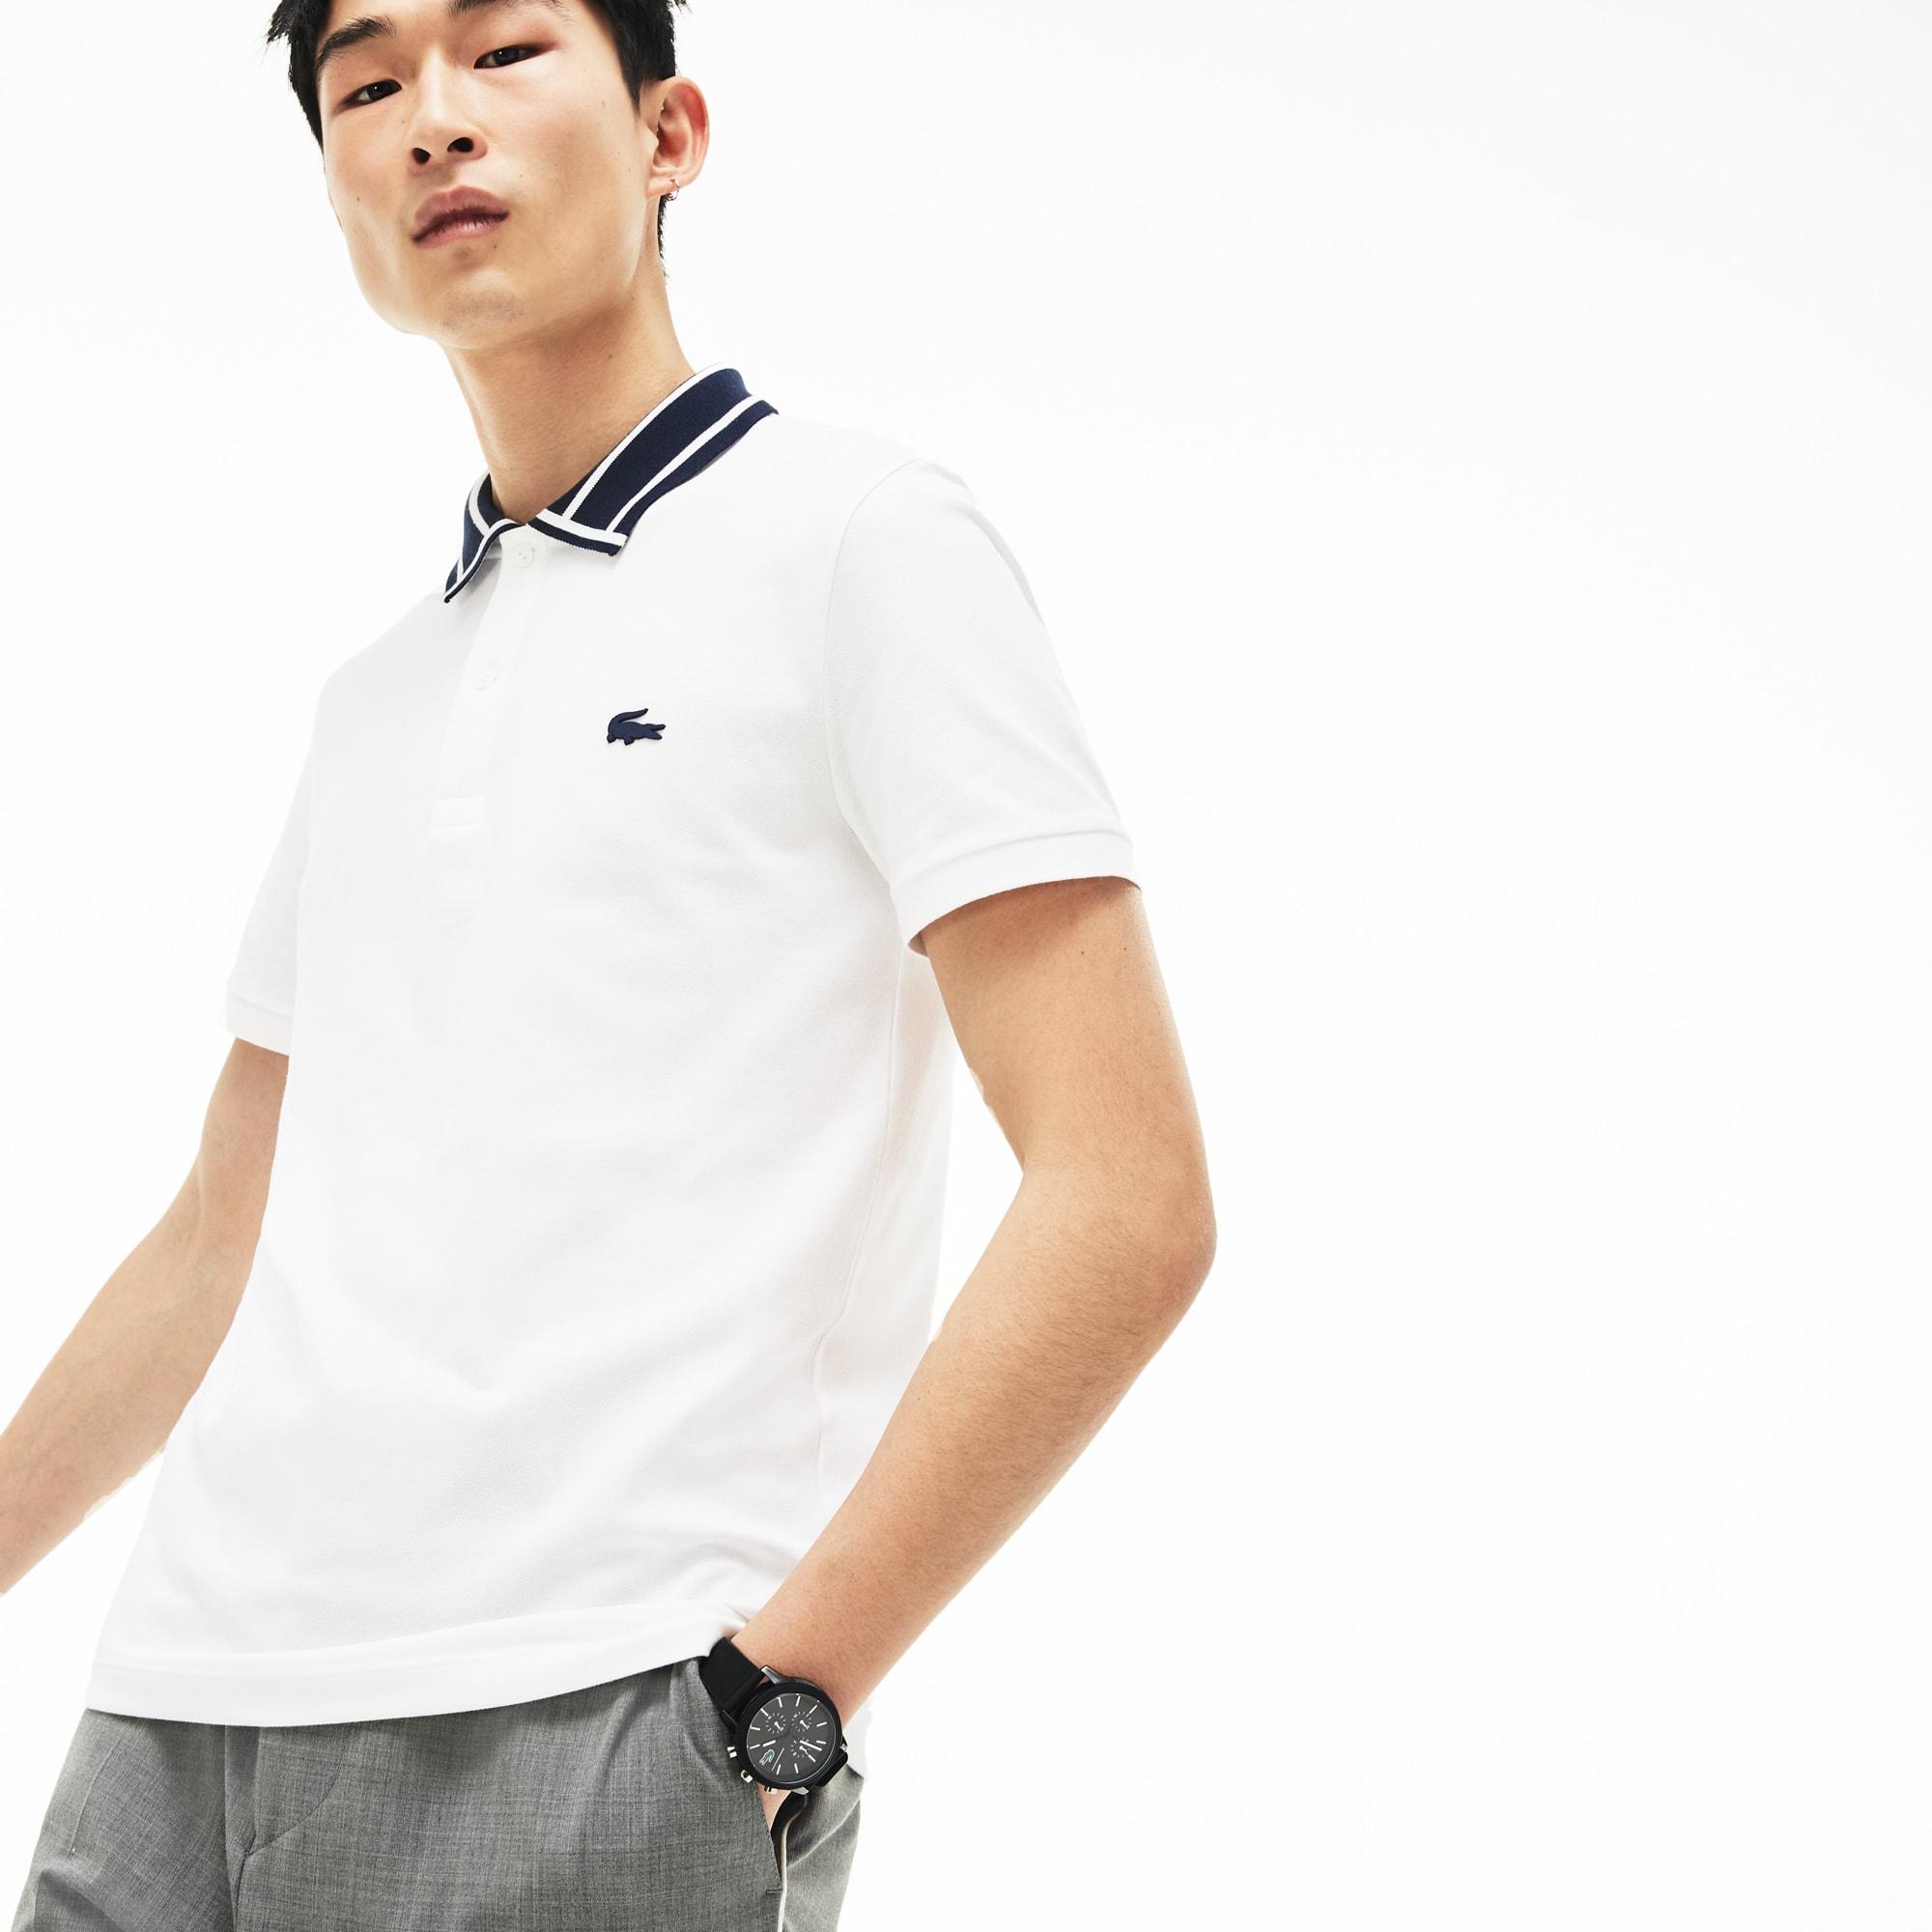 d9b0b3791 Men s Lacoste Slim Fit Piped Neck Stretch Pima Cotton Polo Shirt ...